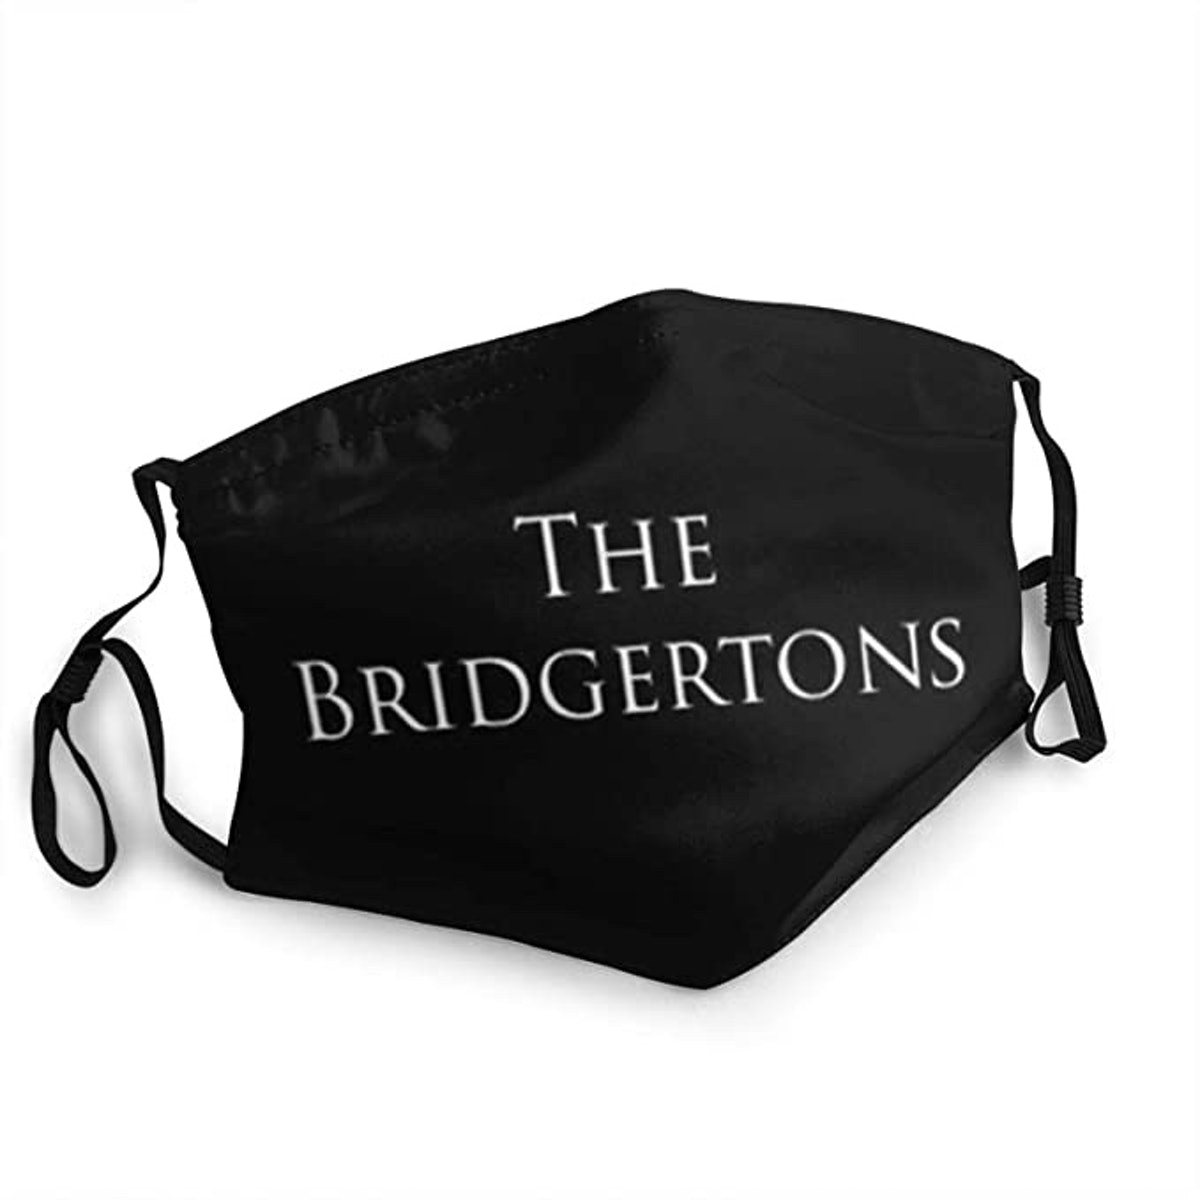 Bridgerton Breathable Outdoor Mouth Mask